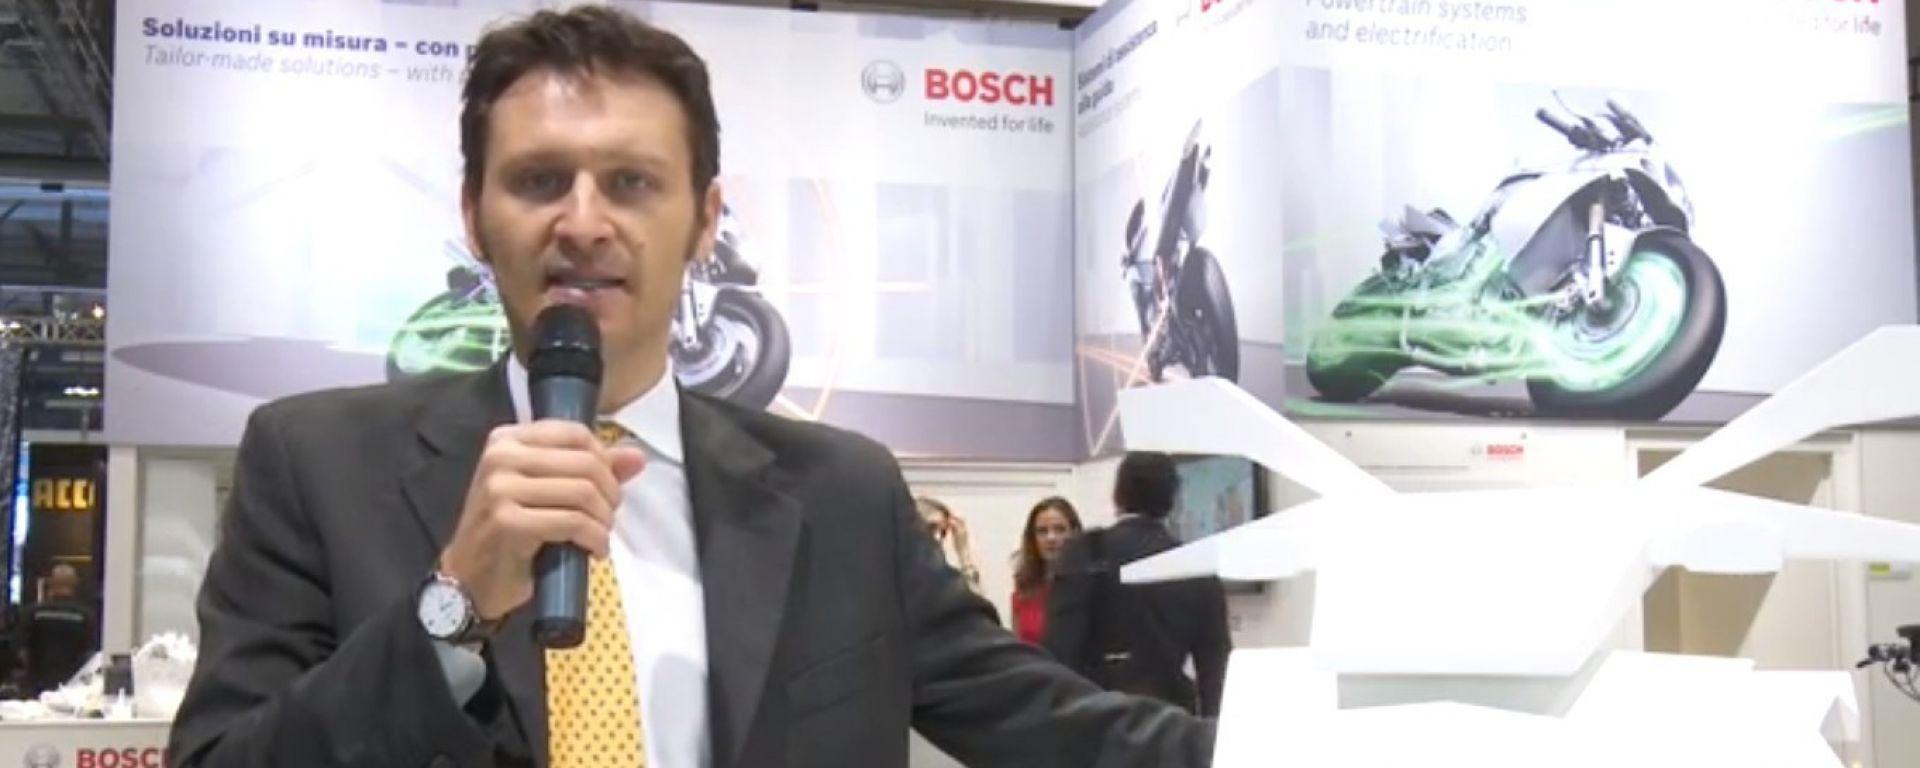 Eicma 2015 - notizie dalle Case: Bosch